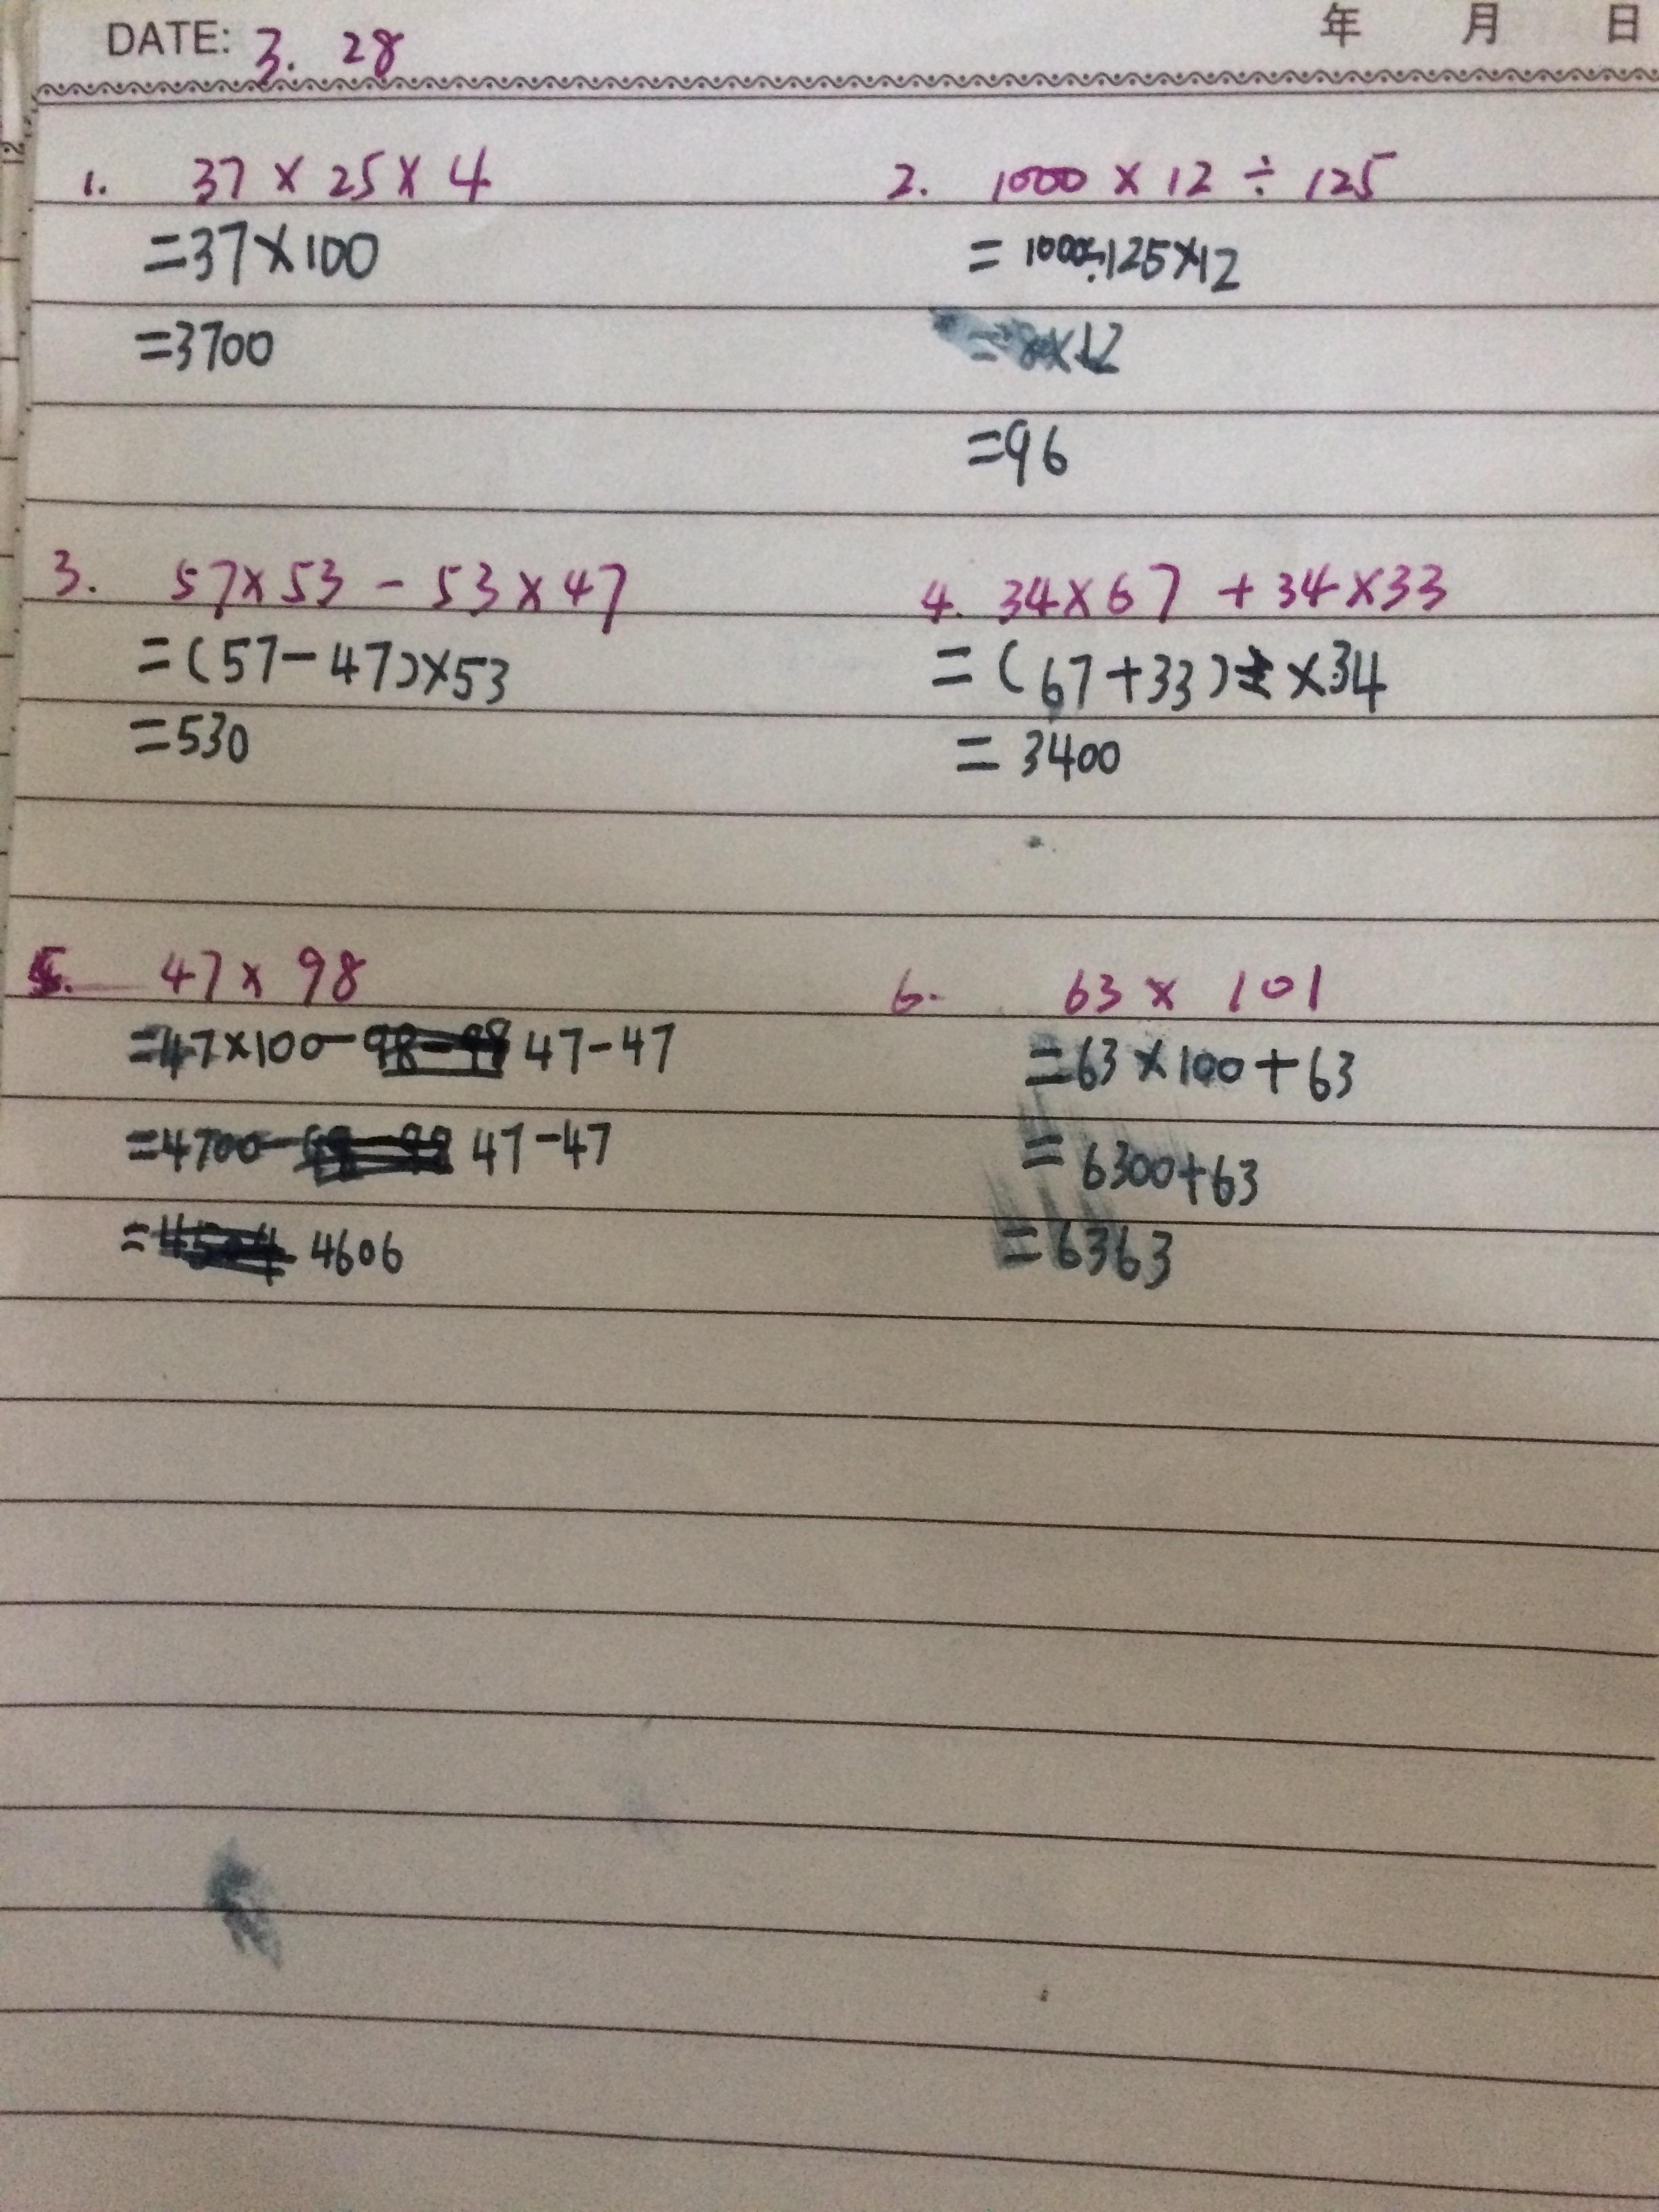 D9FCF800-56F1-4816-9F46-5AC891AC5EB2.jpg